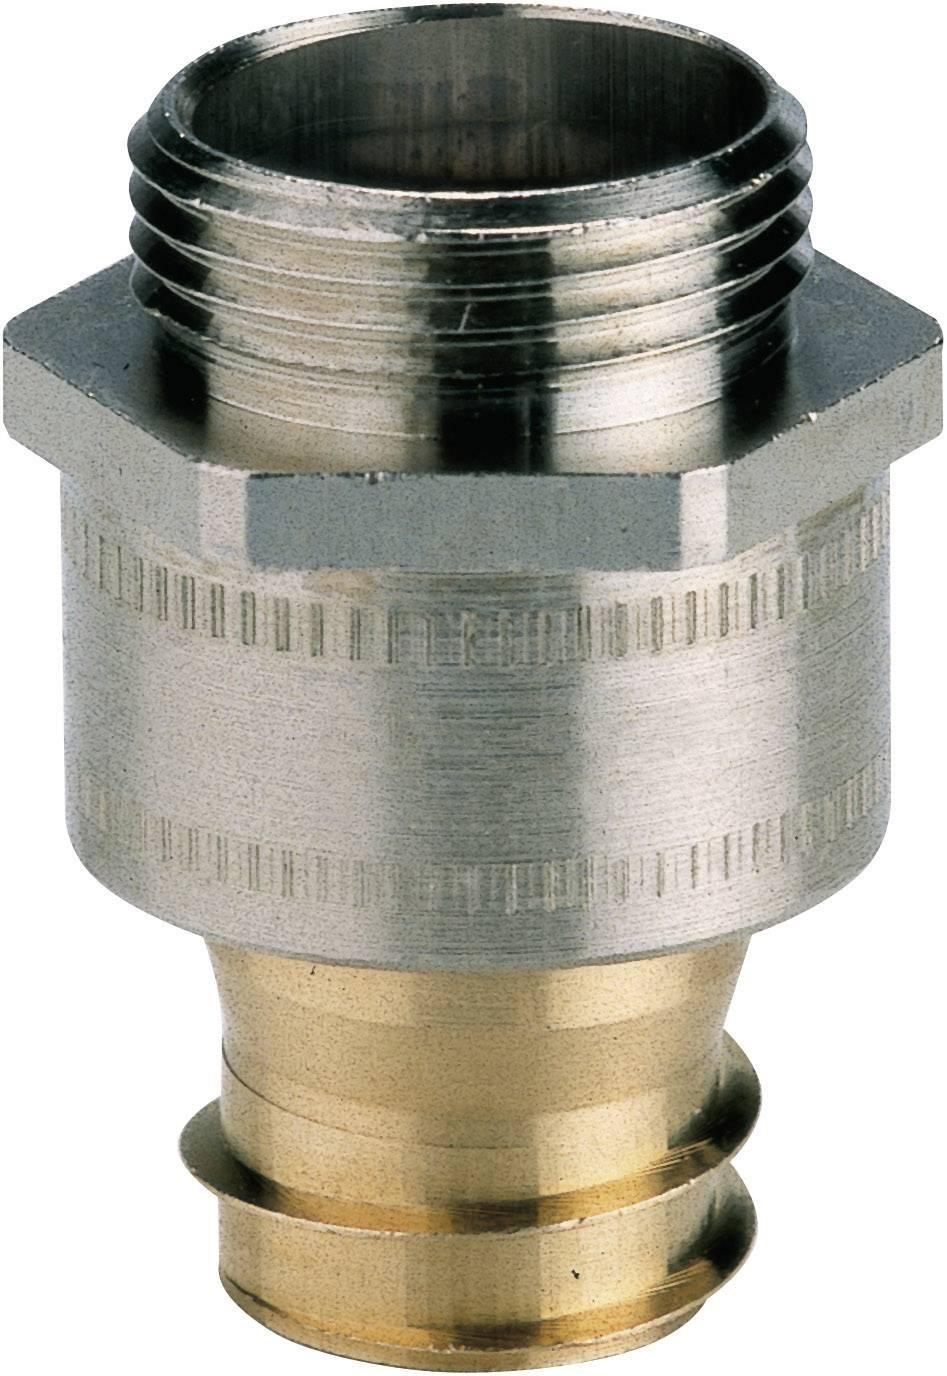 Hadicová spojka rovná LappKabel SILVYN® LI-M 20x1,5 SGY 61802372, M20, stříbrná, 1 ks